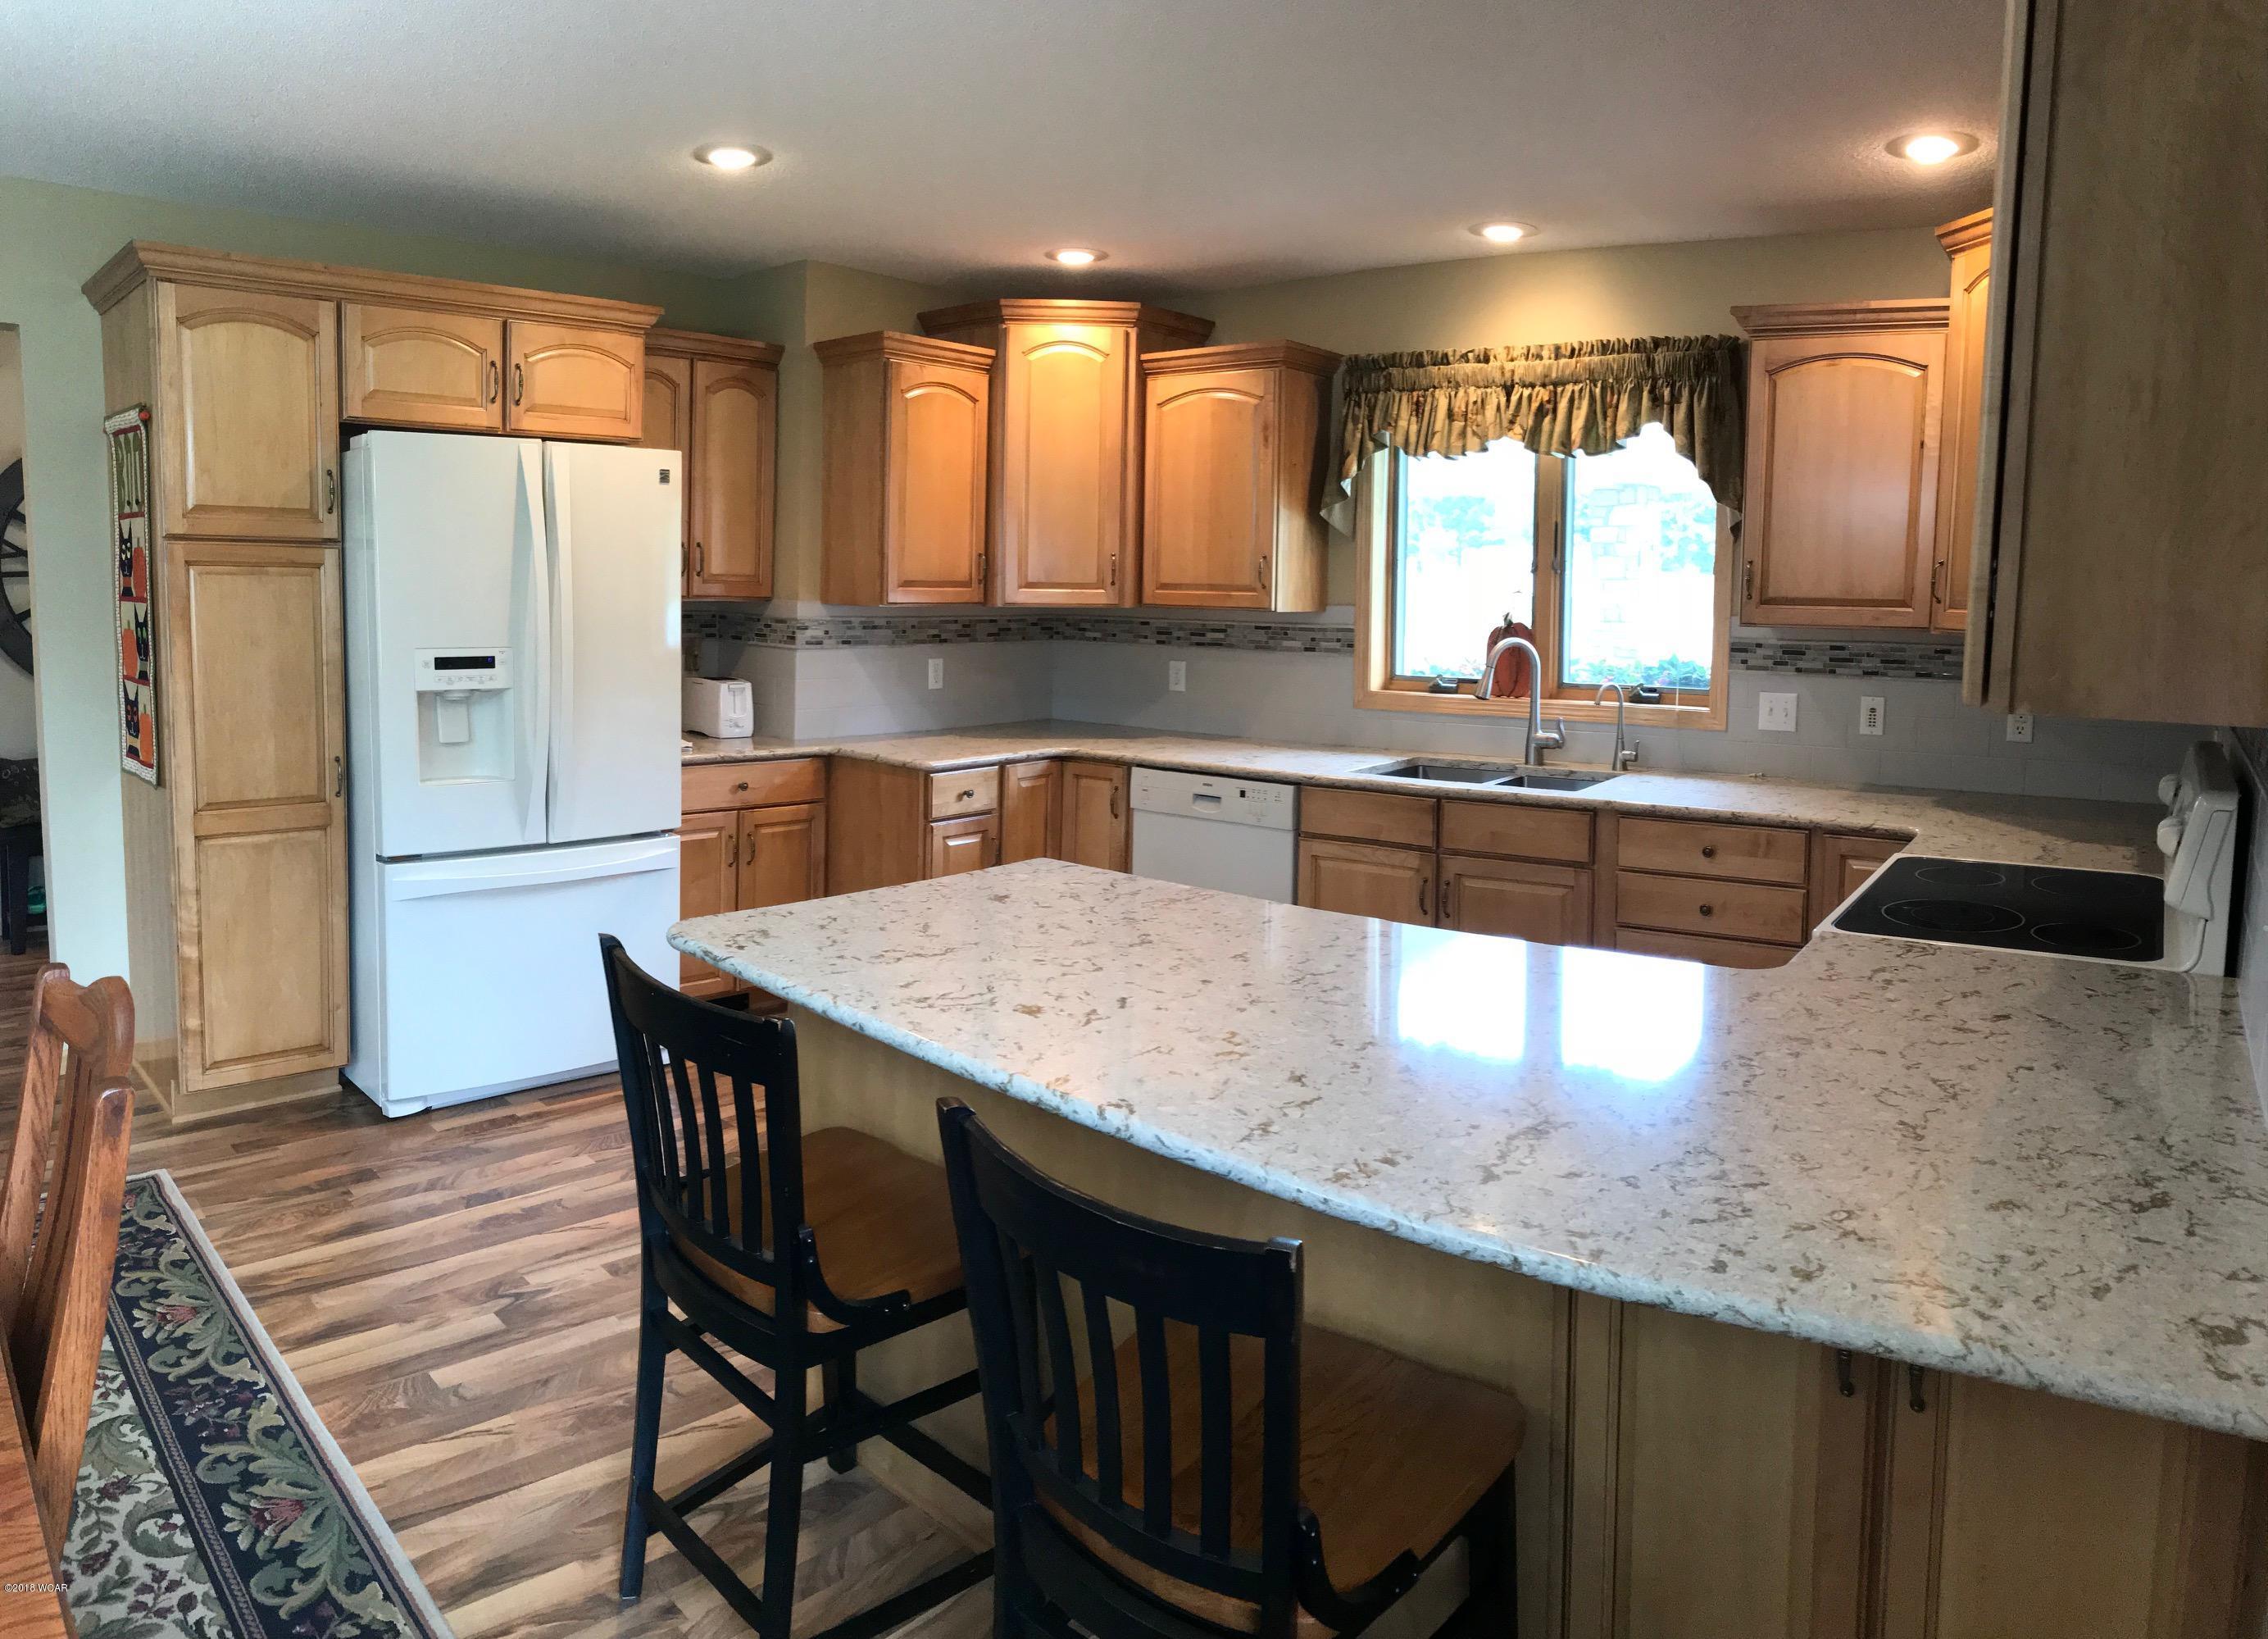 1301 23 Street,Willmar,4 Bedrooms Bedrooms,3 BathroomsBathrooms,Single Family,23 Street,6032310